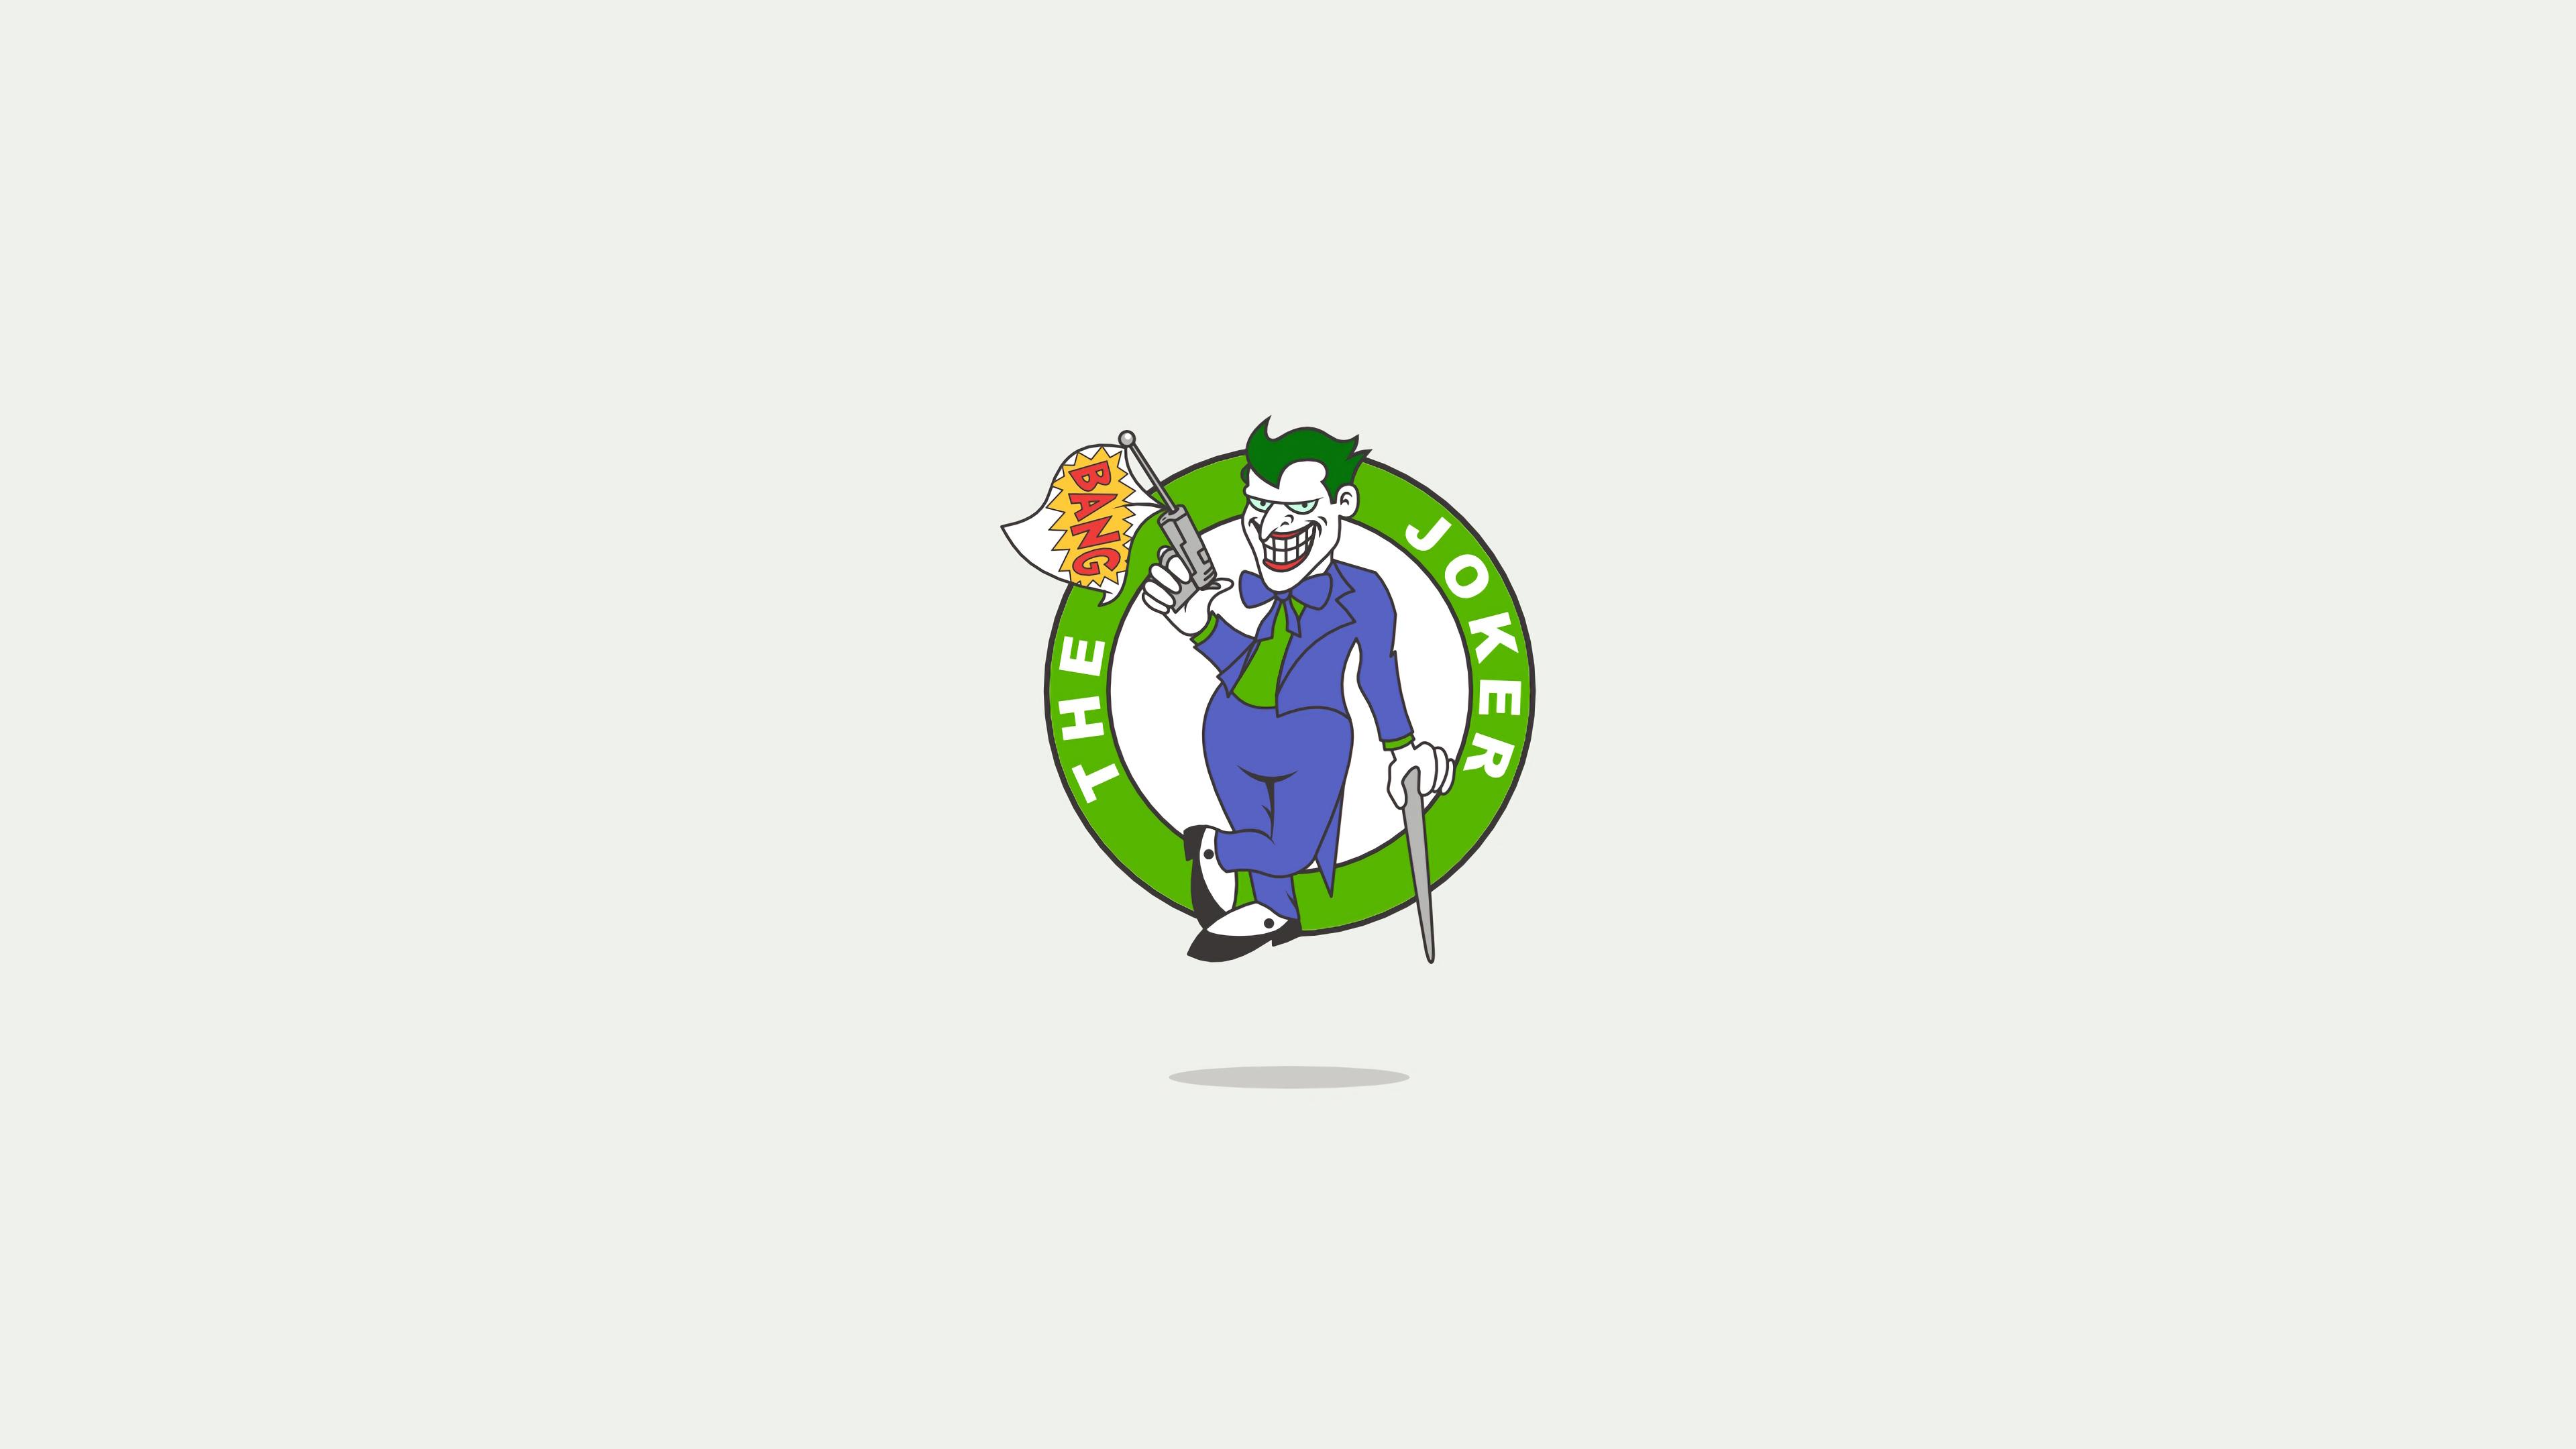 joker minimal logo 1568055517 - Joker Minimal Logo - superheroes wallpapers, minimalist wallpapers, minimalism wallpapers, joker wallpapers, hd-wallpapers, behance wallpapers, 4k-wallpapers